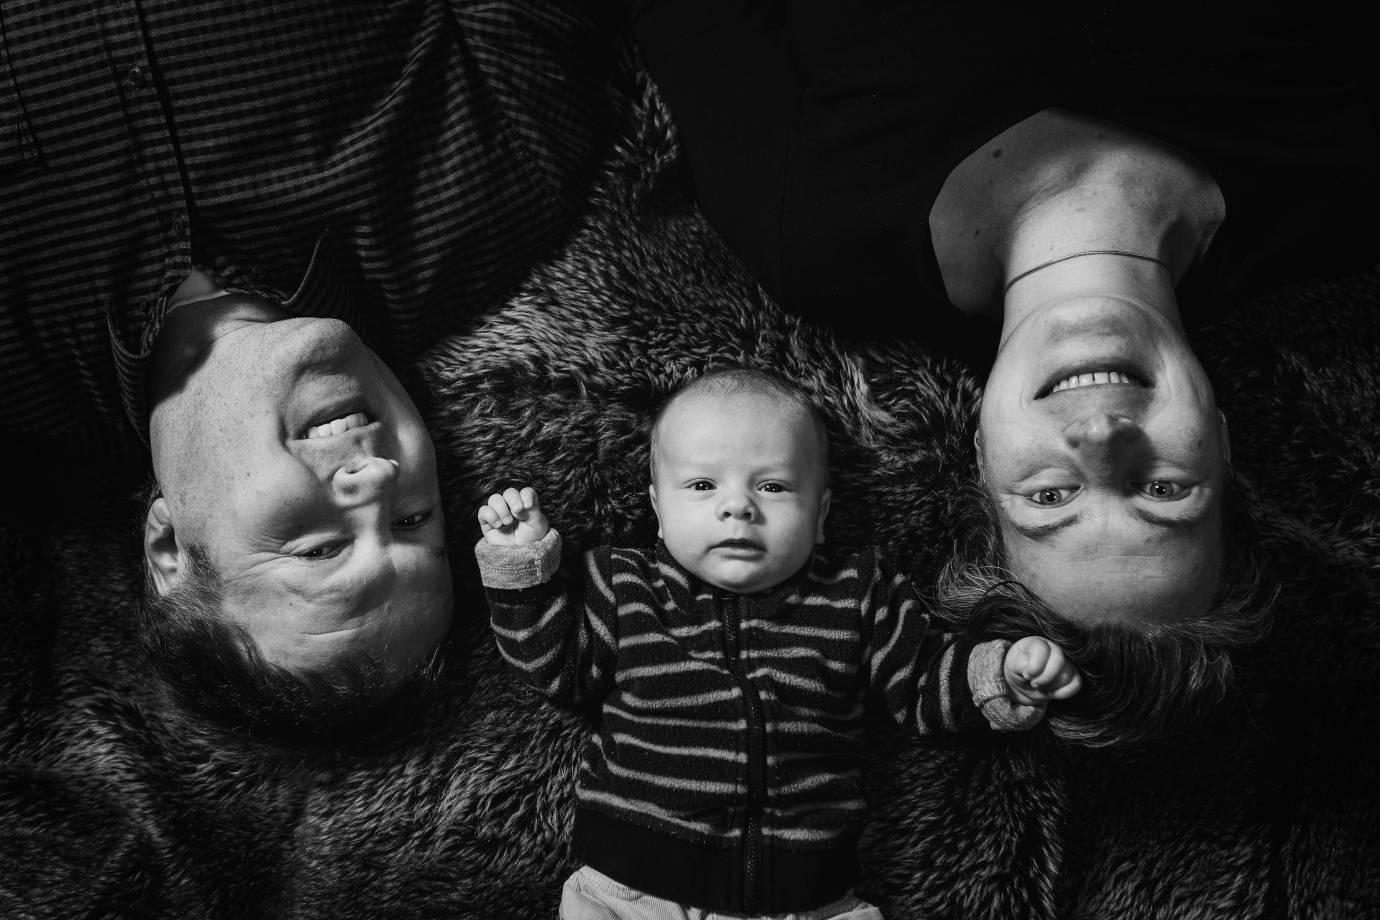 babyfotograf lilienthal 5 - Max